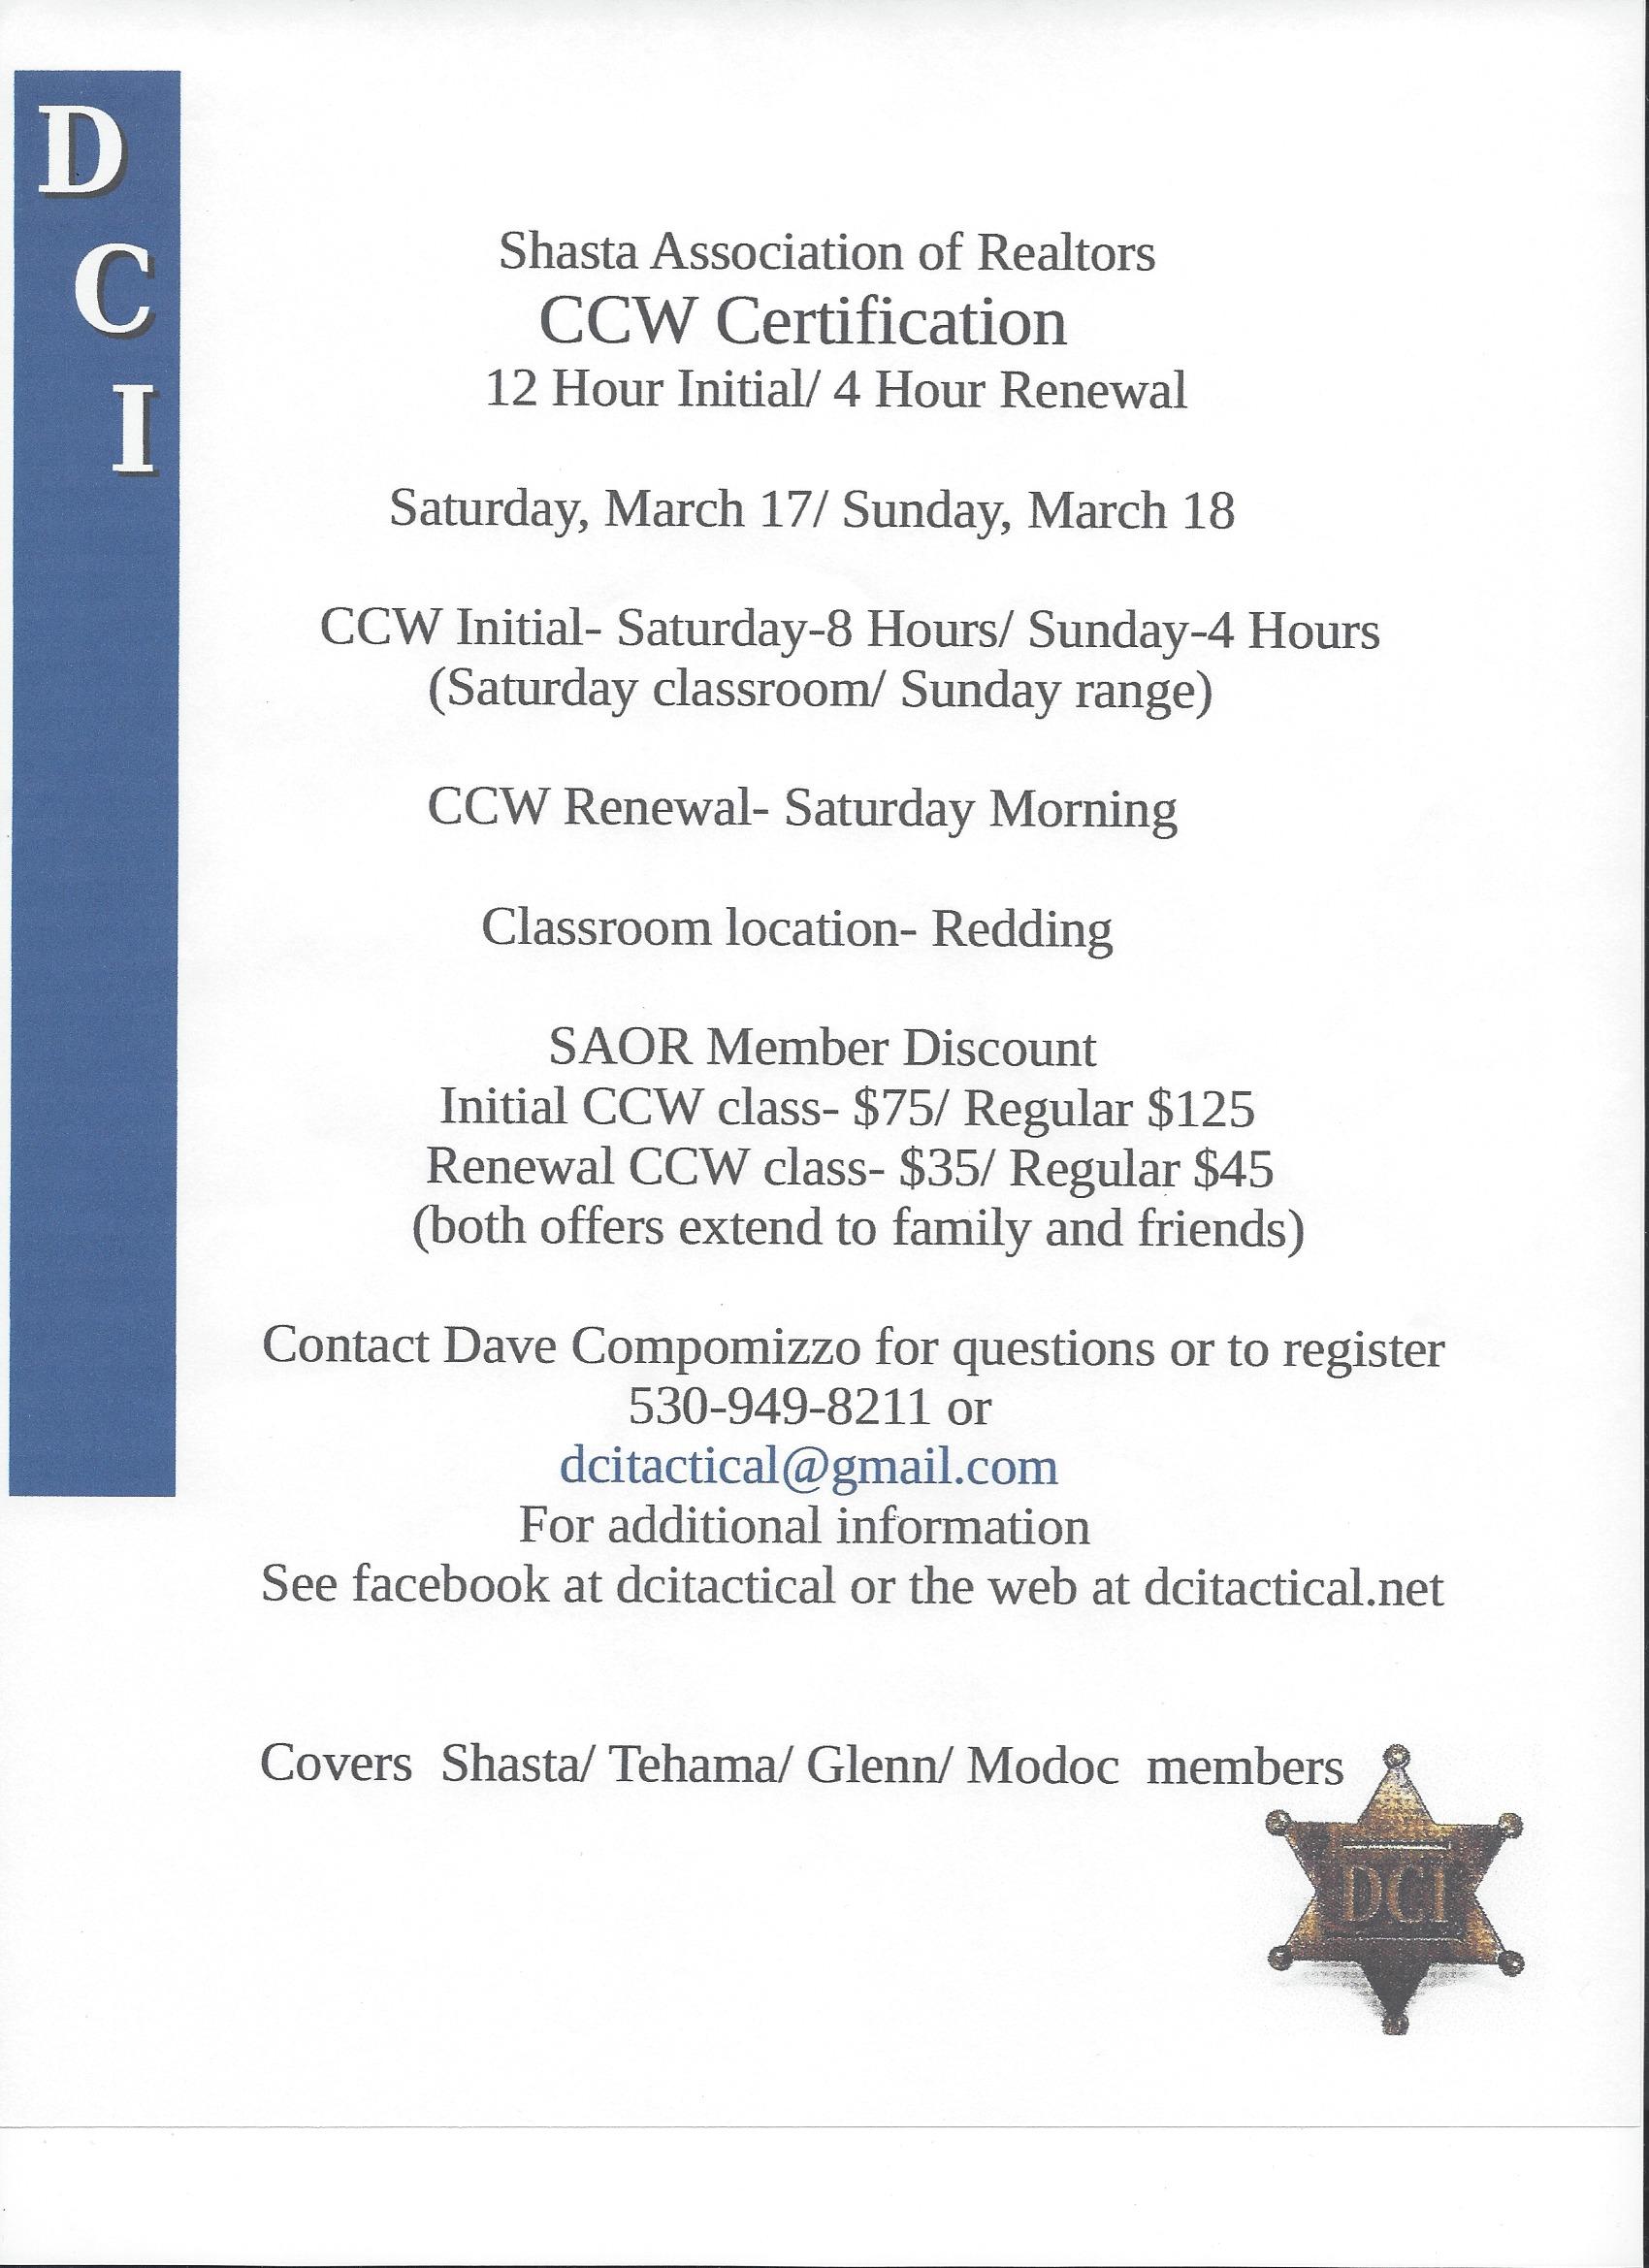 18-02-26;DCI Tactical CWP Training Mar 2018.jpg